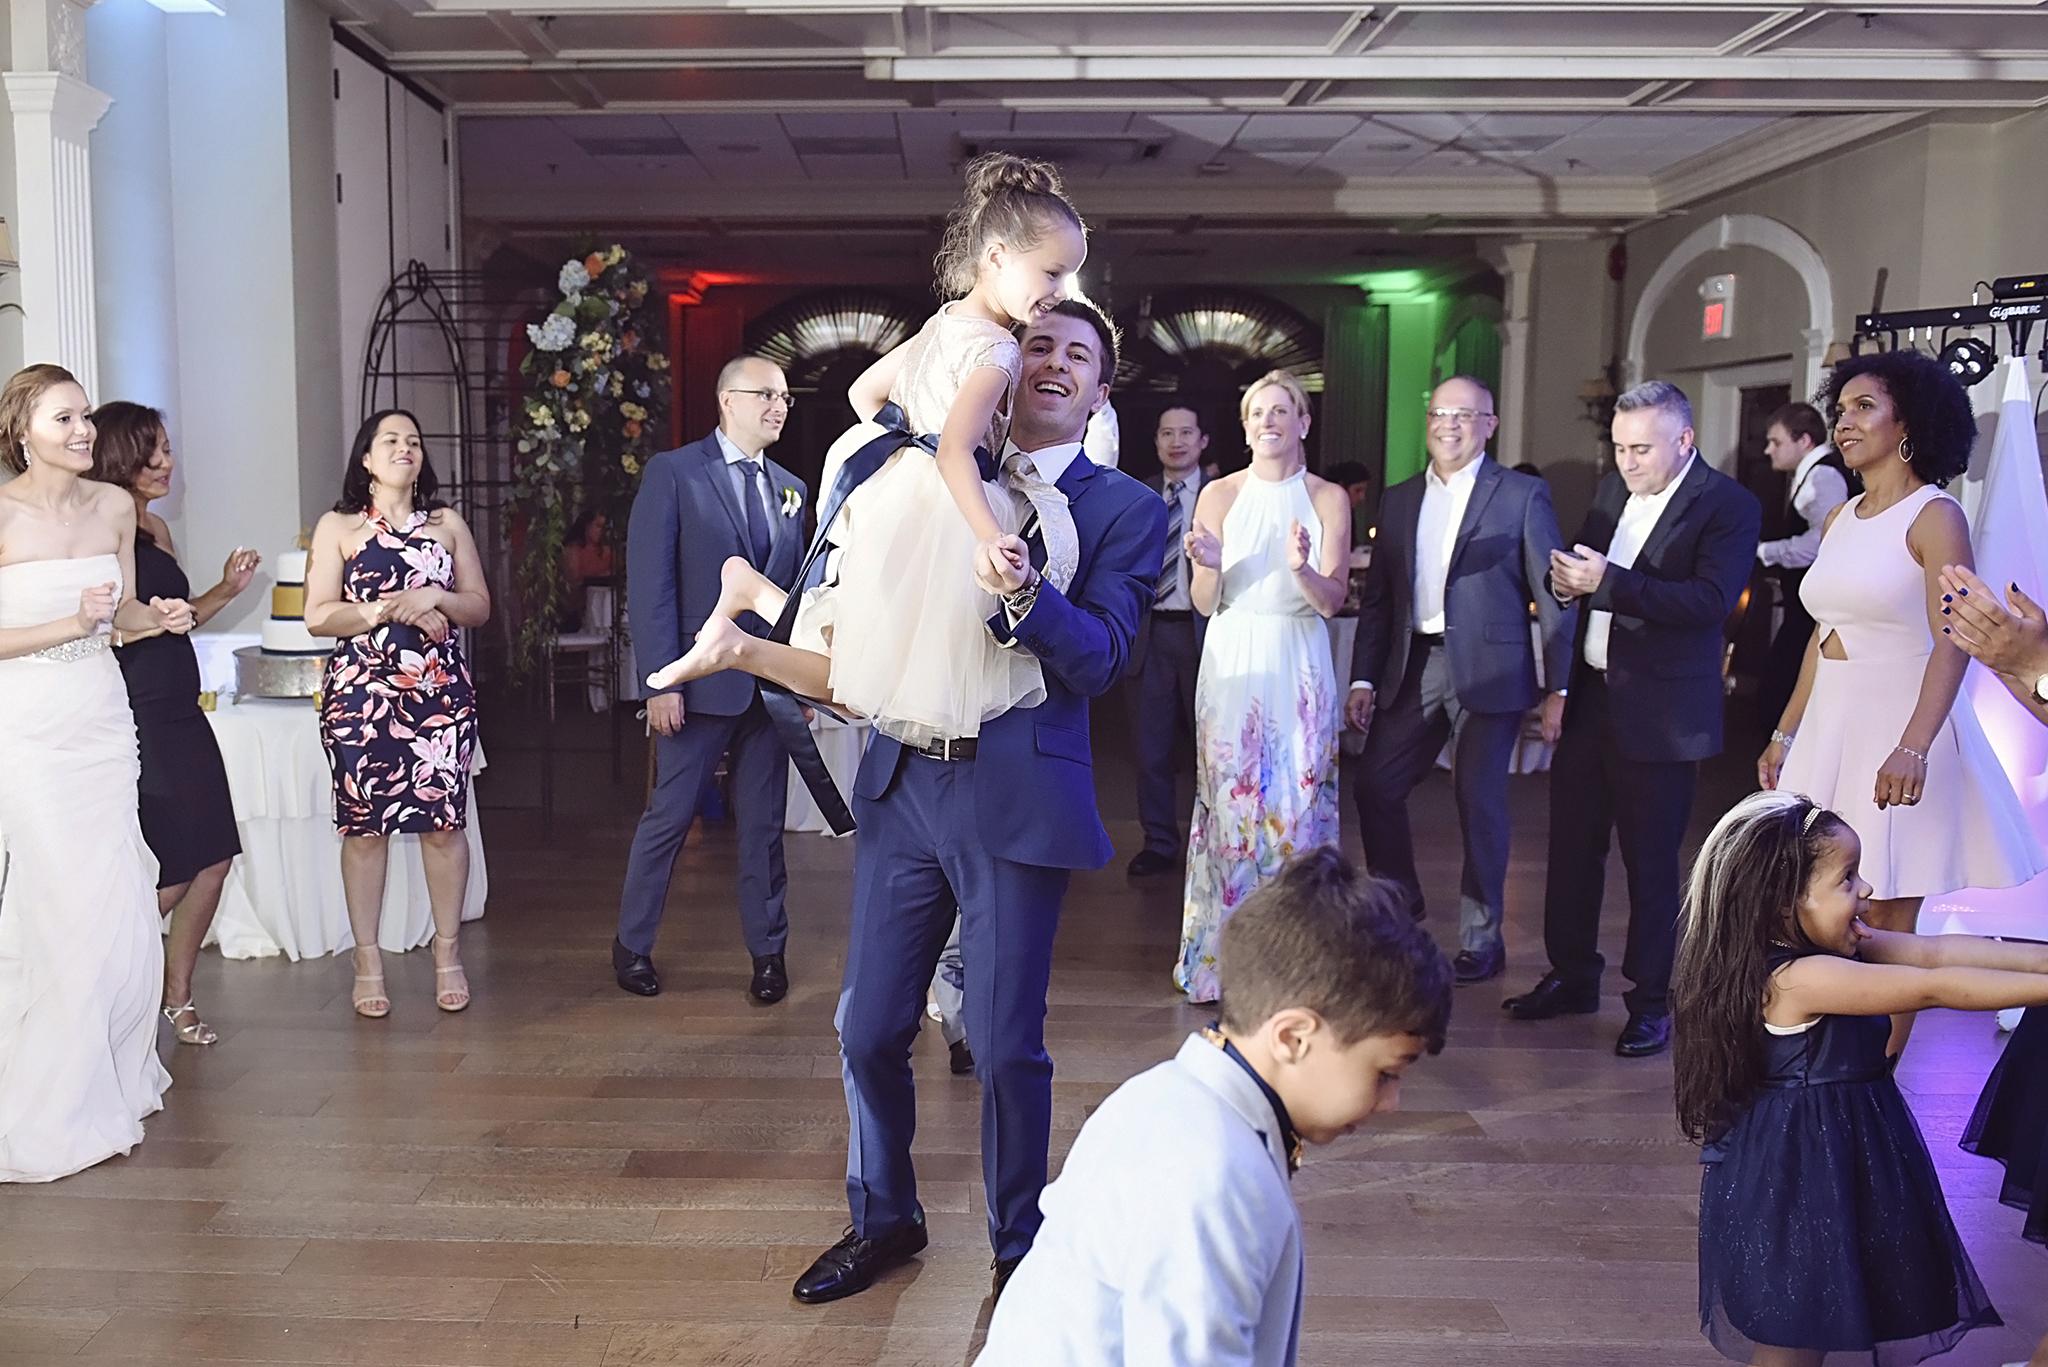 NJ-NY-wedding-photographer-163NJ-NY-wedding-photographer-163NJ-NY-WEDDING-PHOTOGRAPHER-163.JPG